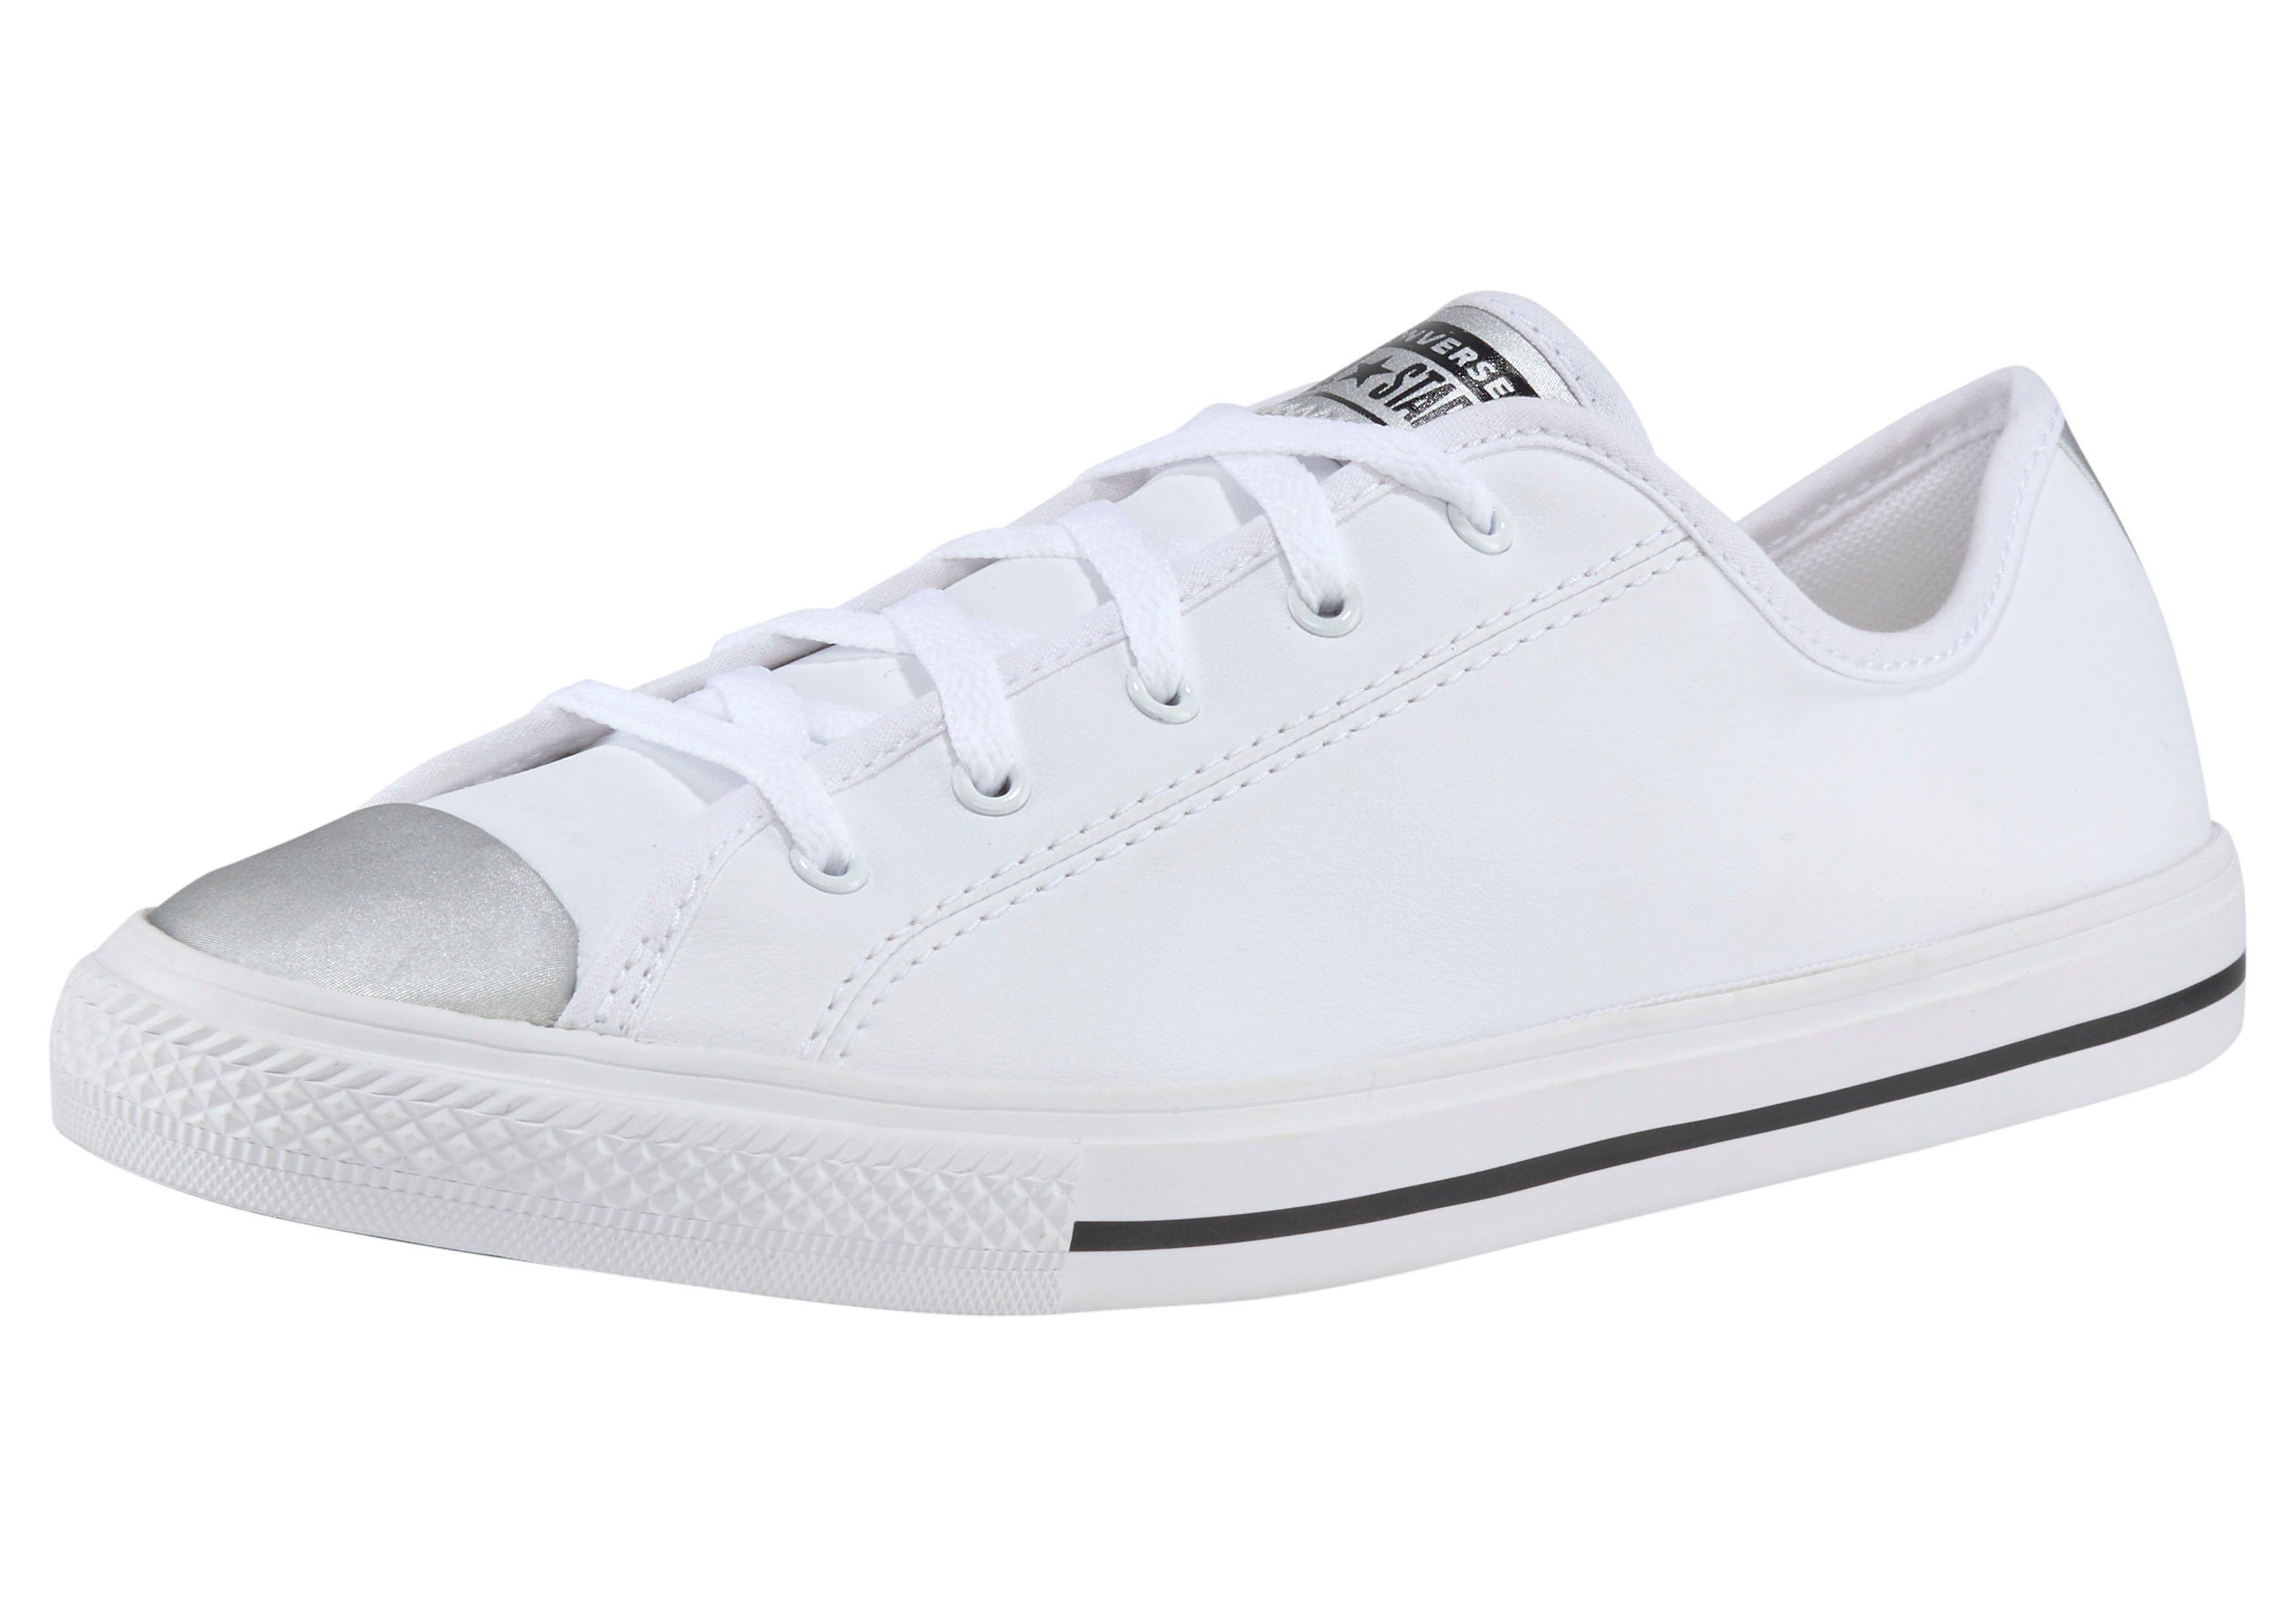 Converse sneakers CHUCK TAYLOR ALL STAR DAINTY MONO METALLIC bestellen: 30 dagen bedenktijd